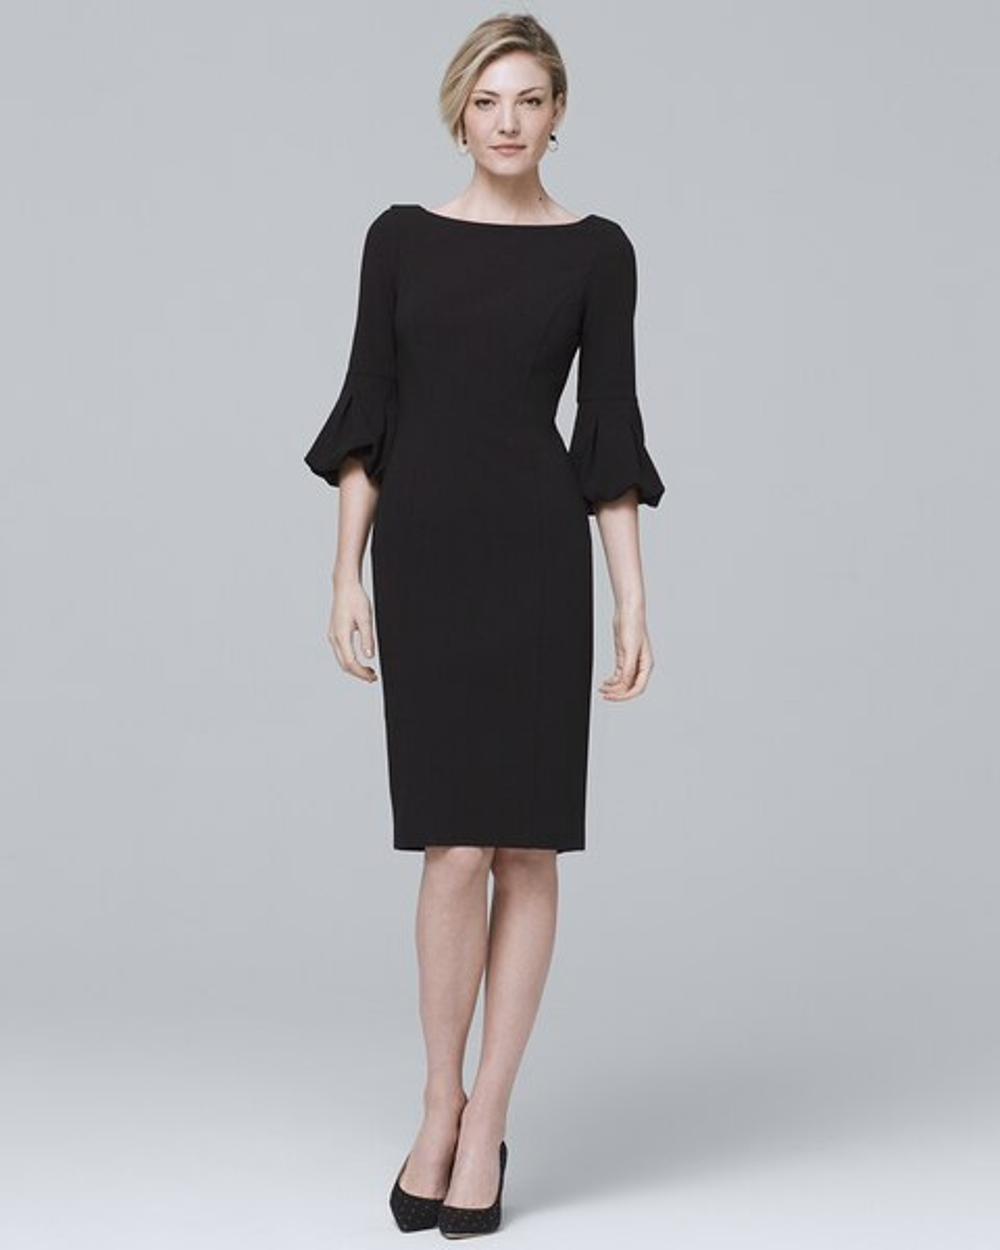 1fa075ecede8e Body Perfecting Lantern-Sleeve Black Sheath Dress - White House Black Market